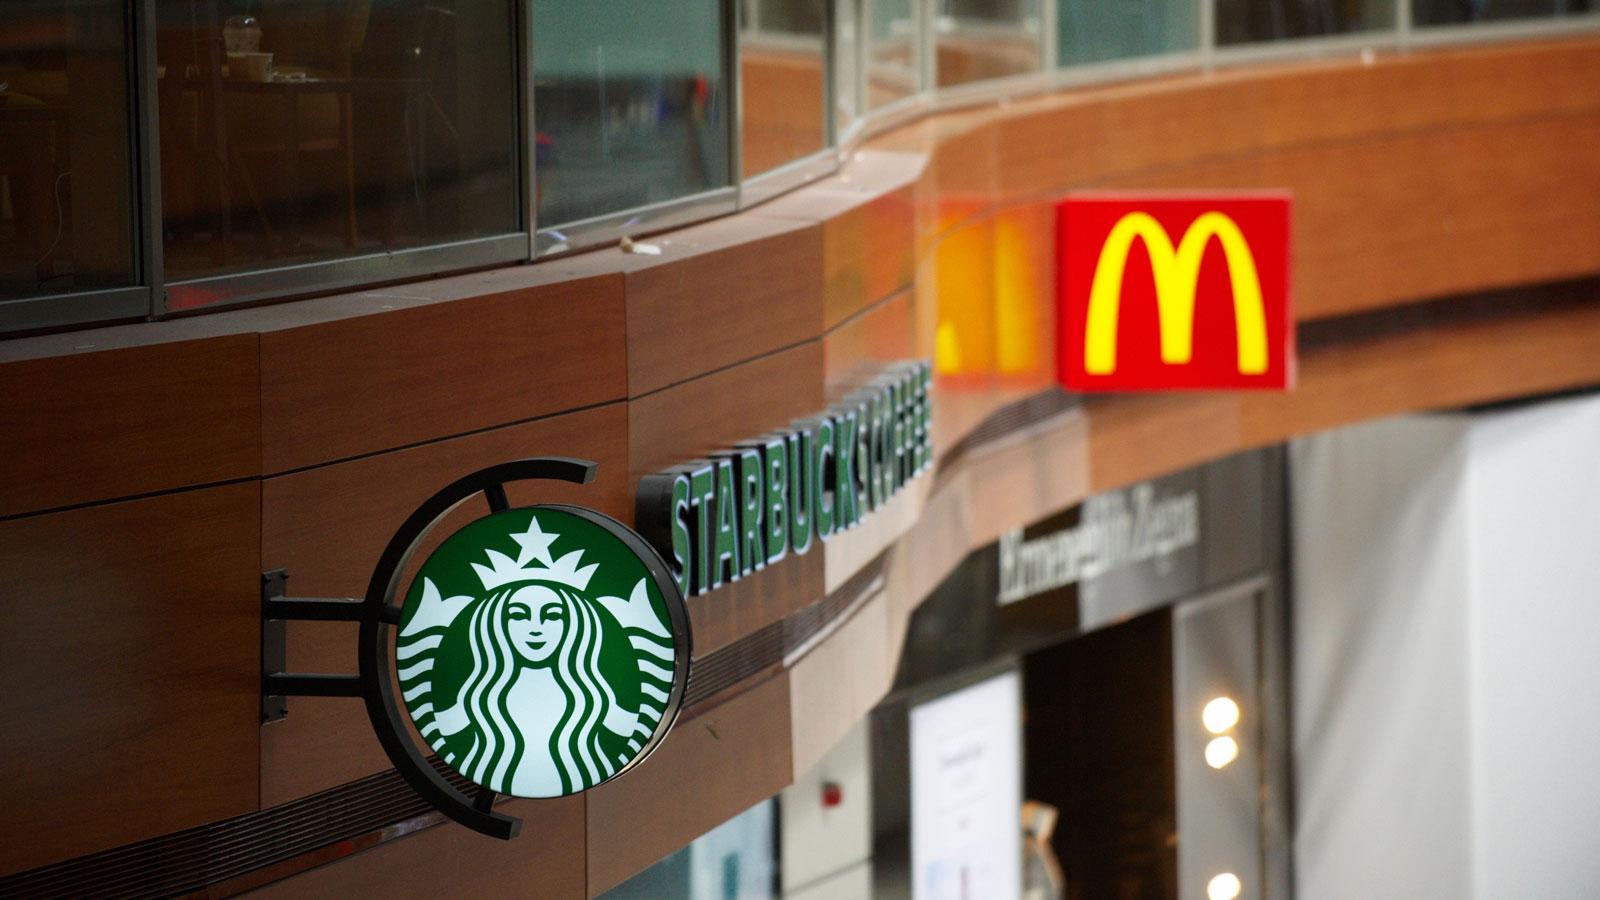 EC: London to Ban New Fast Food Restaurants Near Schools